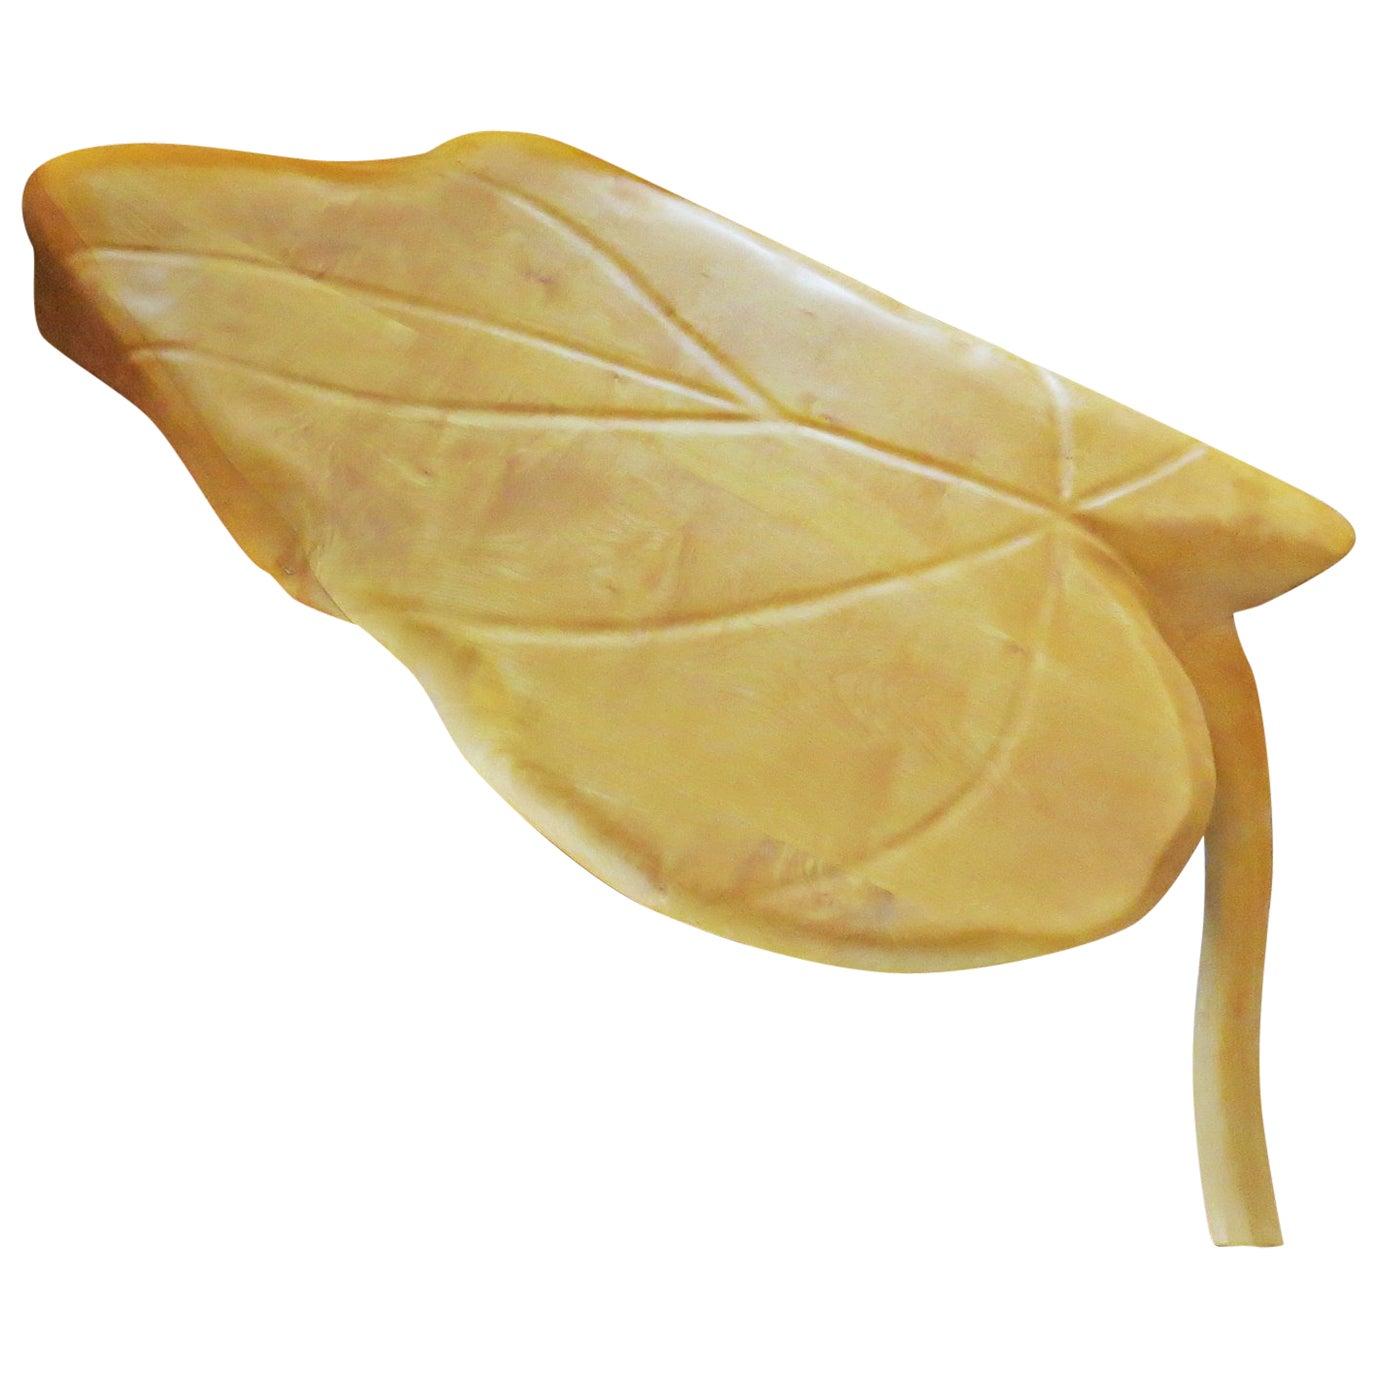 Coffee Table, Leaf Shape, Maple Solid Organic Shaped